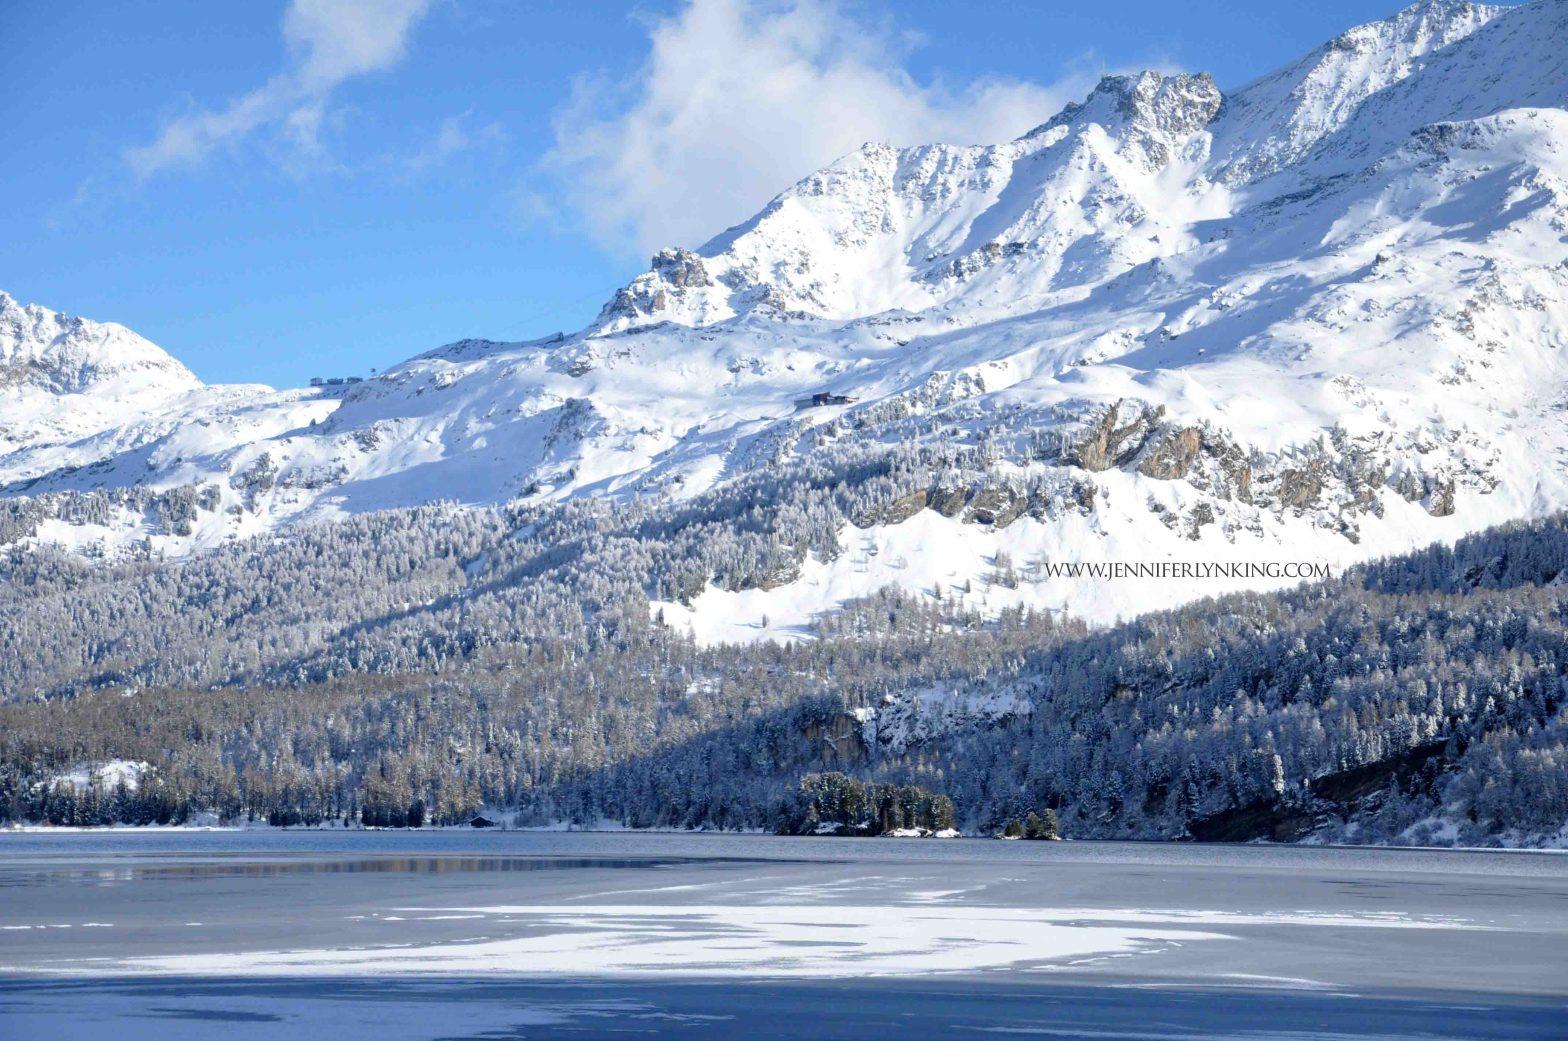 St. Moritz and Engadin, Switzerland